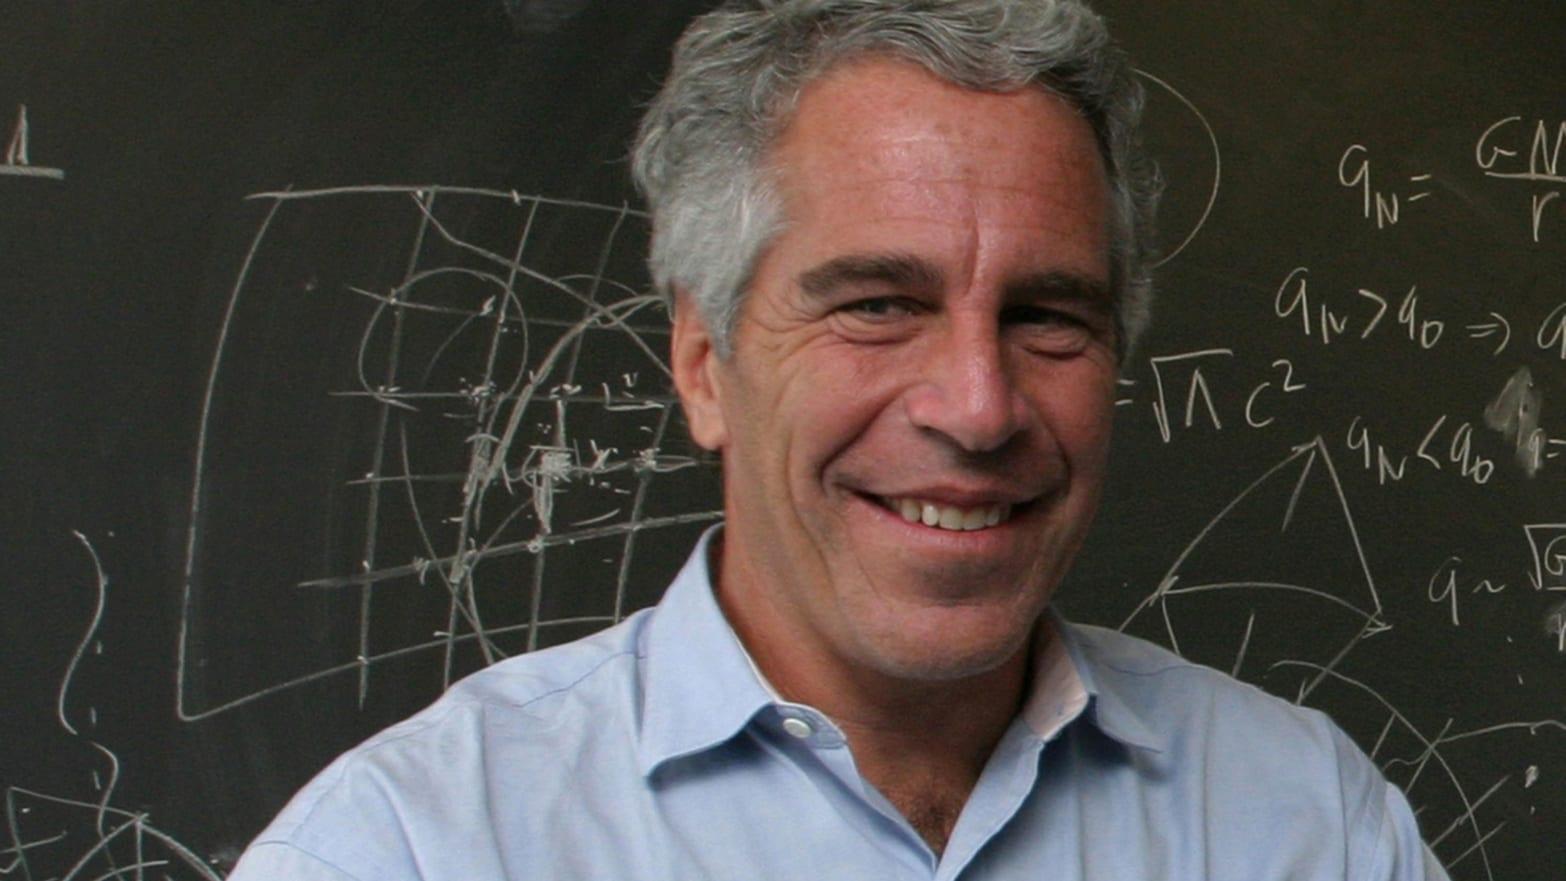 Jeffrey Epstein, Billionaire Pedophile, Goes Free